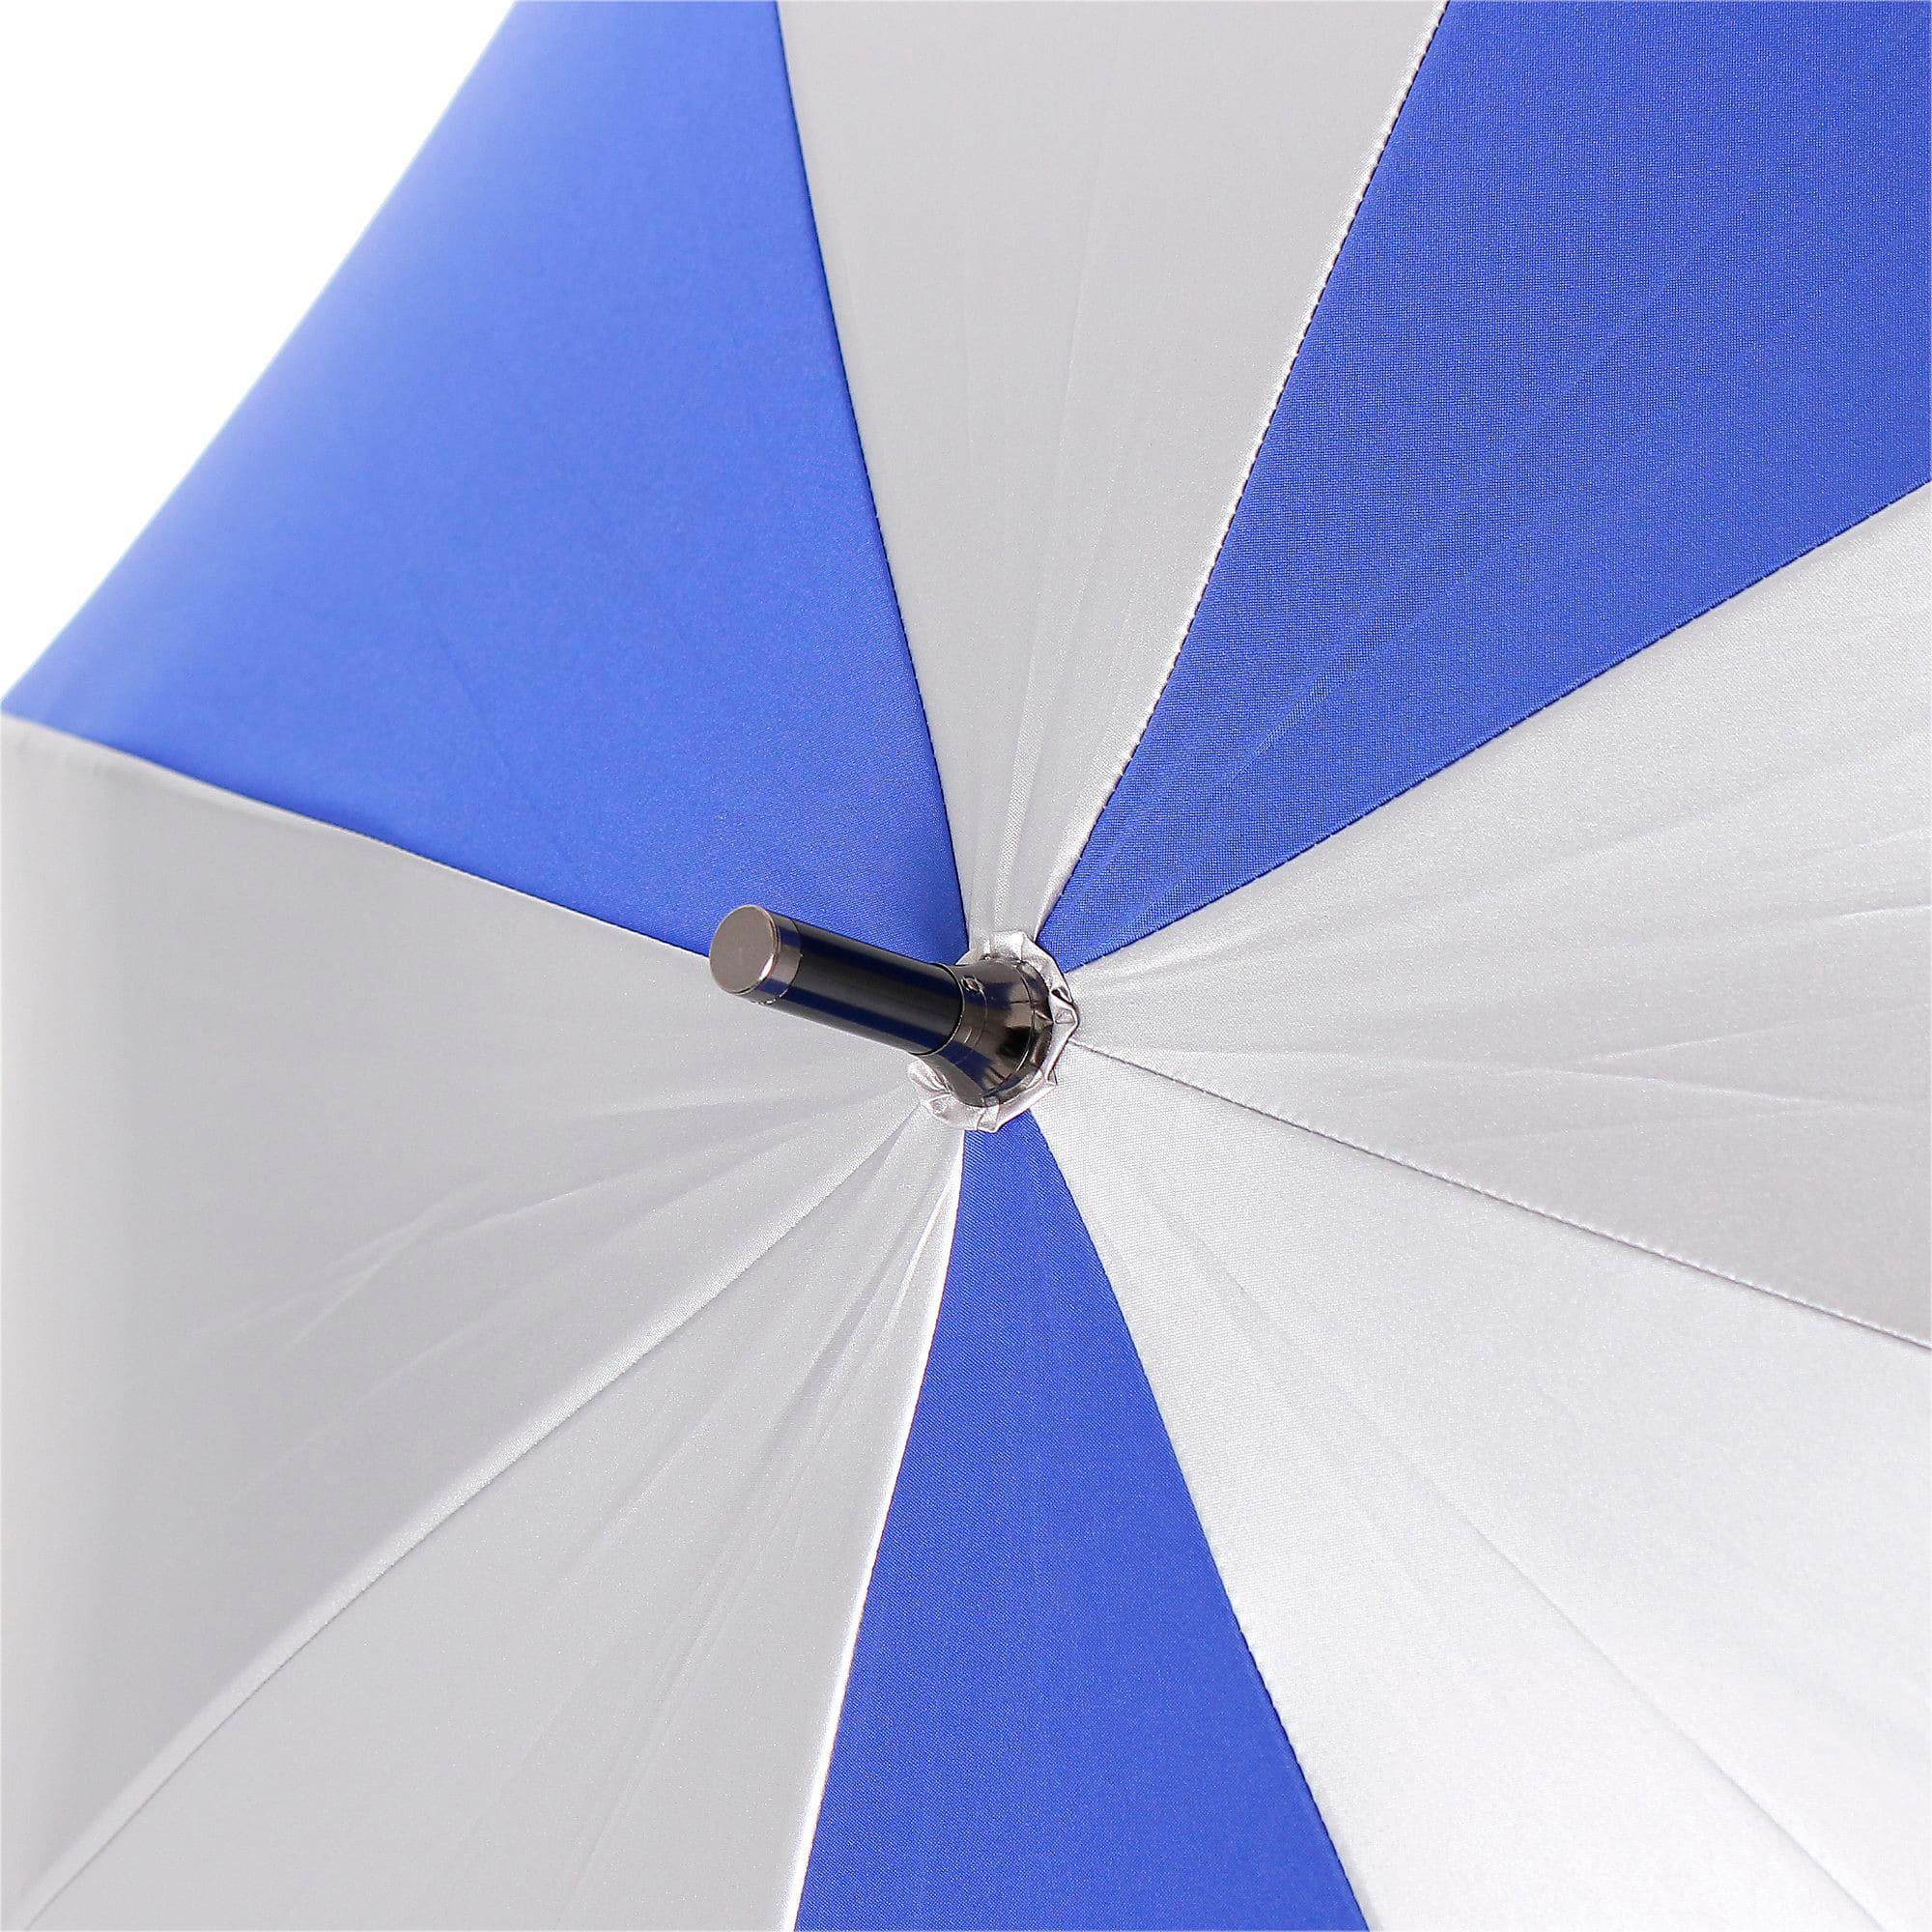 Thumbnail 8 of ゴルフ UVカット シルバー 70 傘, snokel blue, medium-JPN